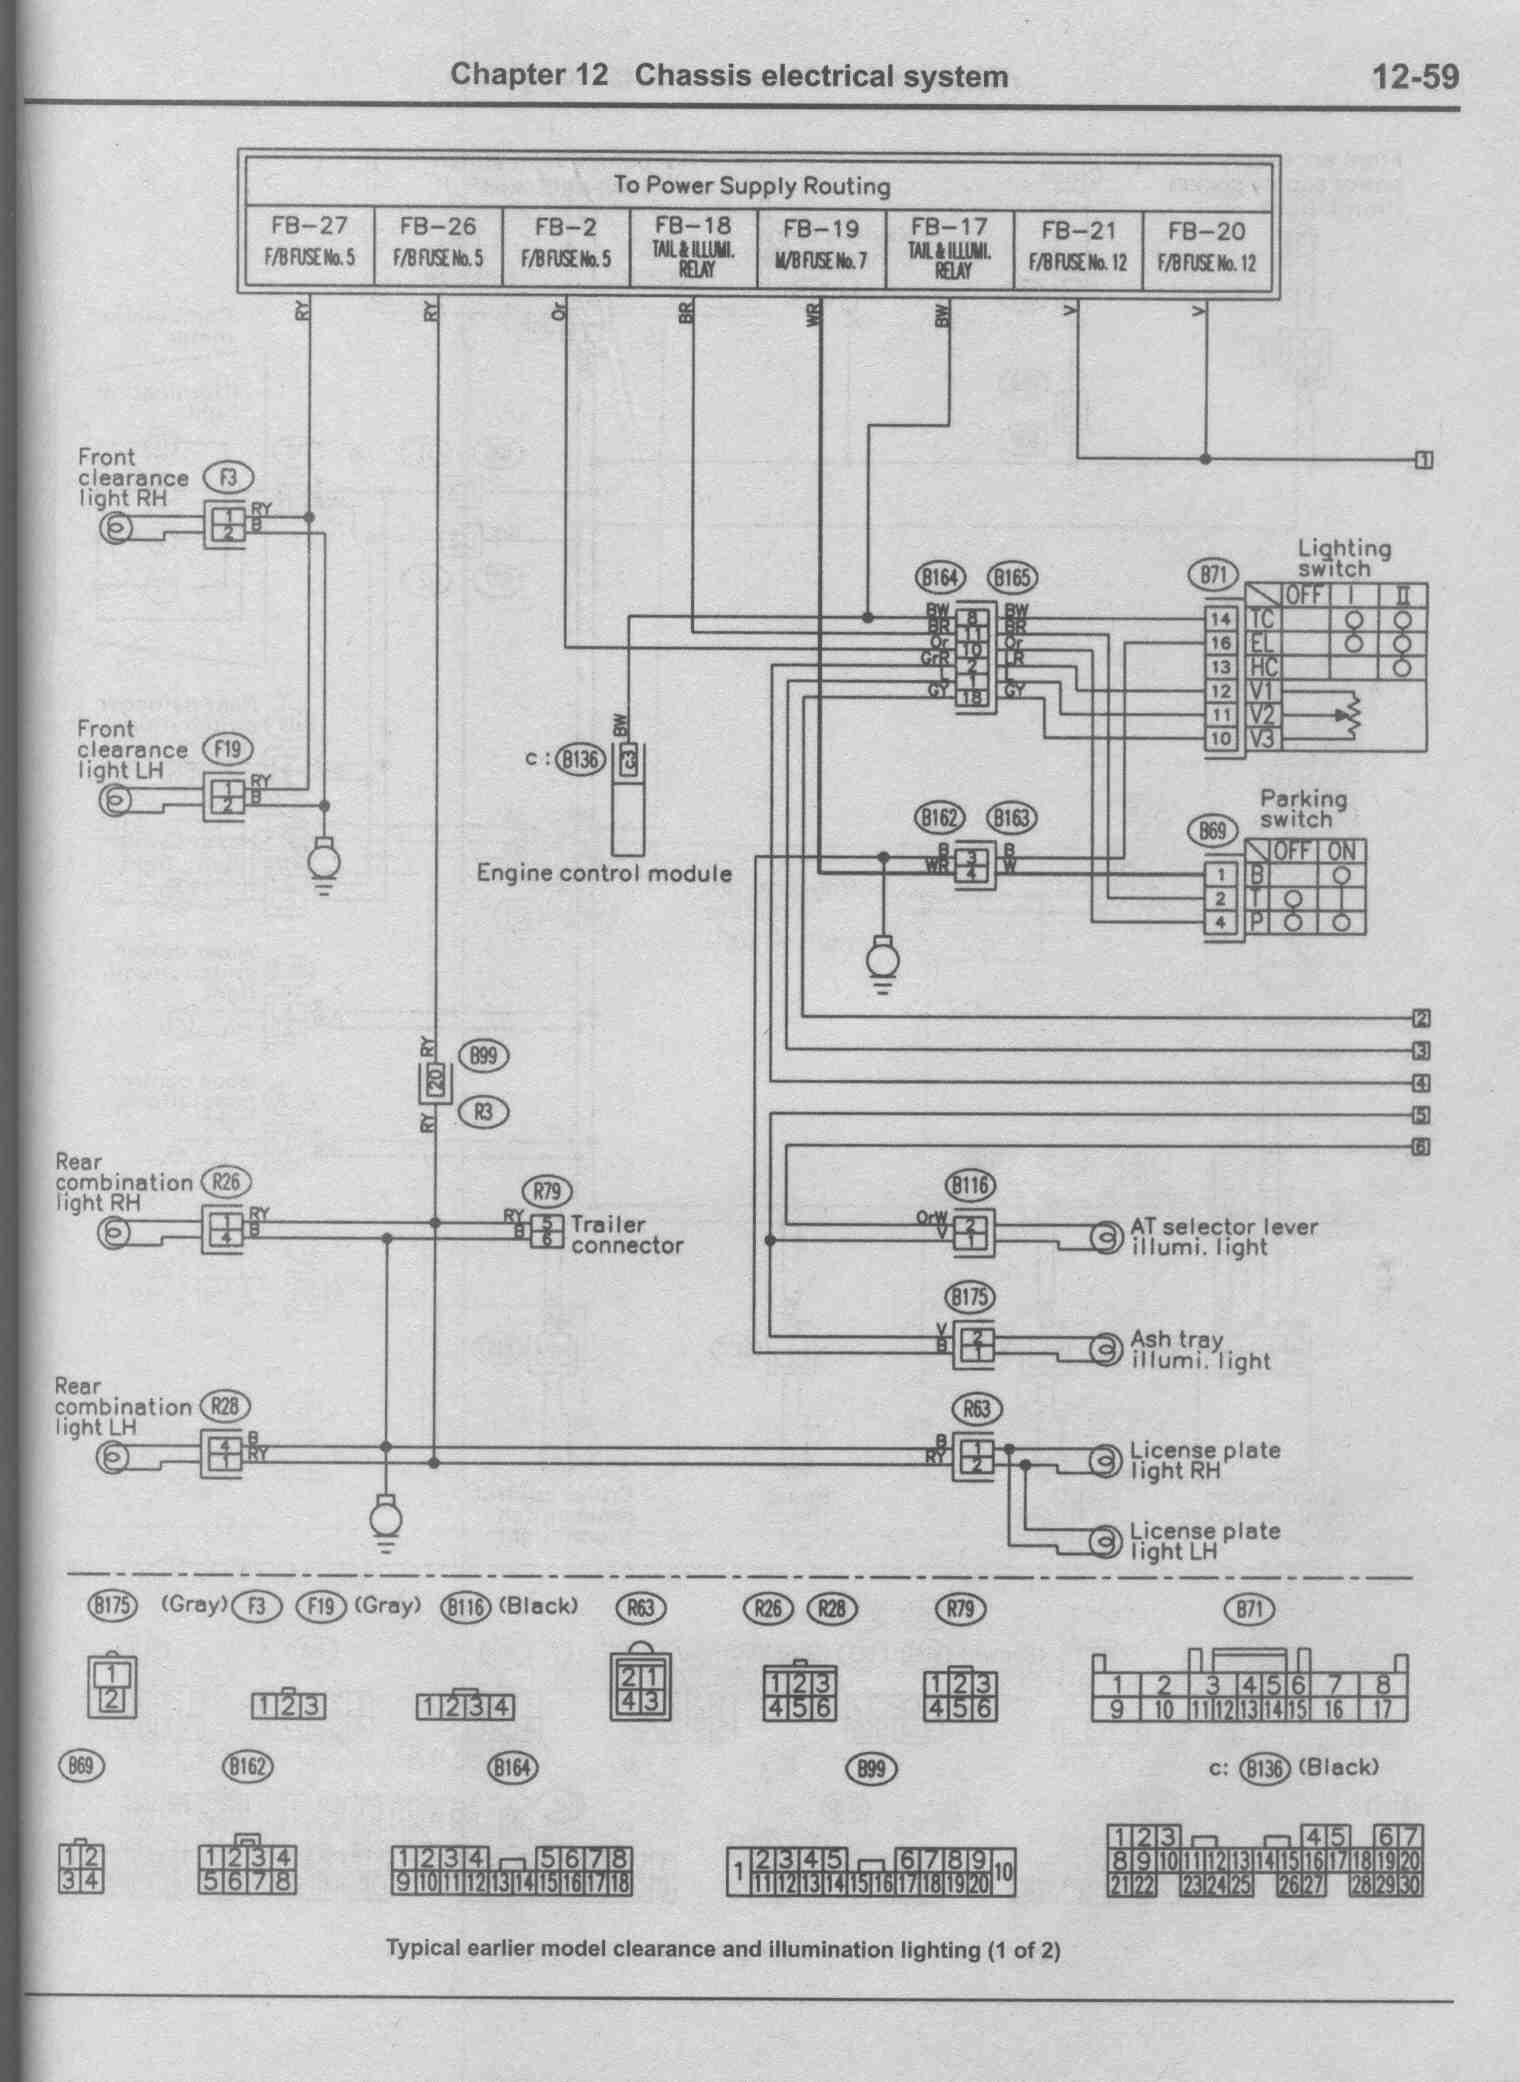 Wiring Diagram 2002 Outback - Wiring Diagram Hyundai Accent 2001 for Wiring  Diagram SchematicsWiring Diagram Schematics